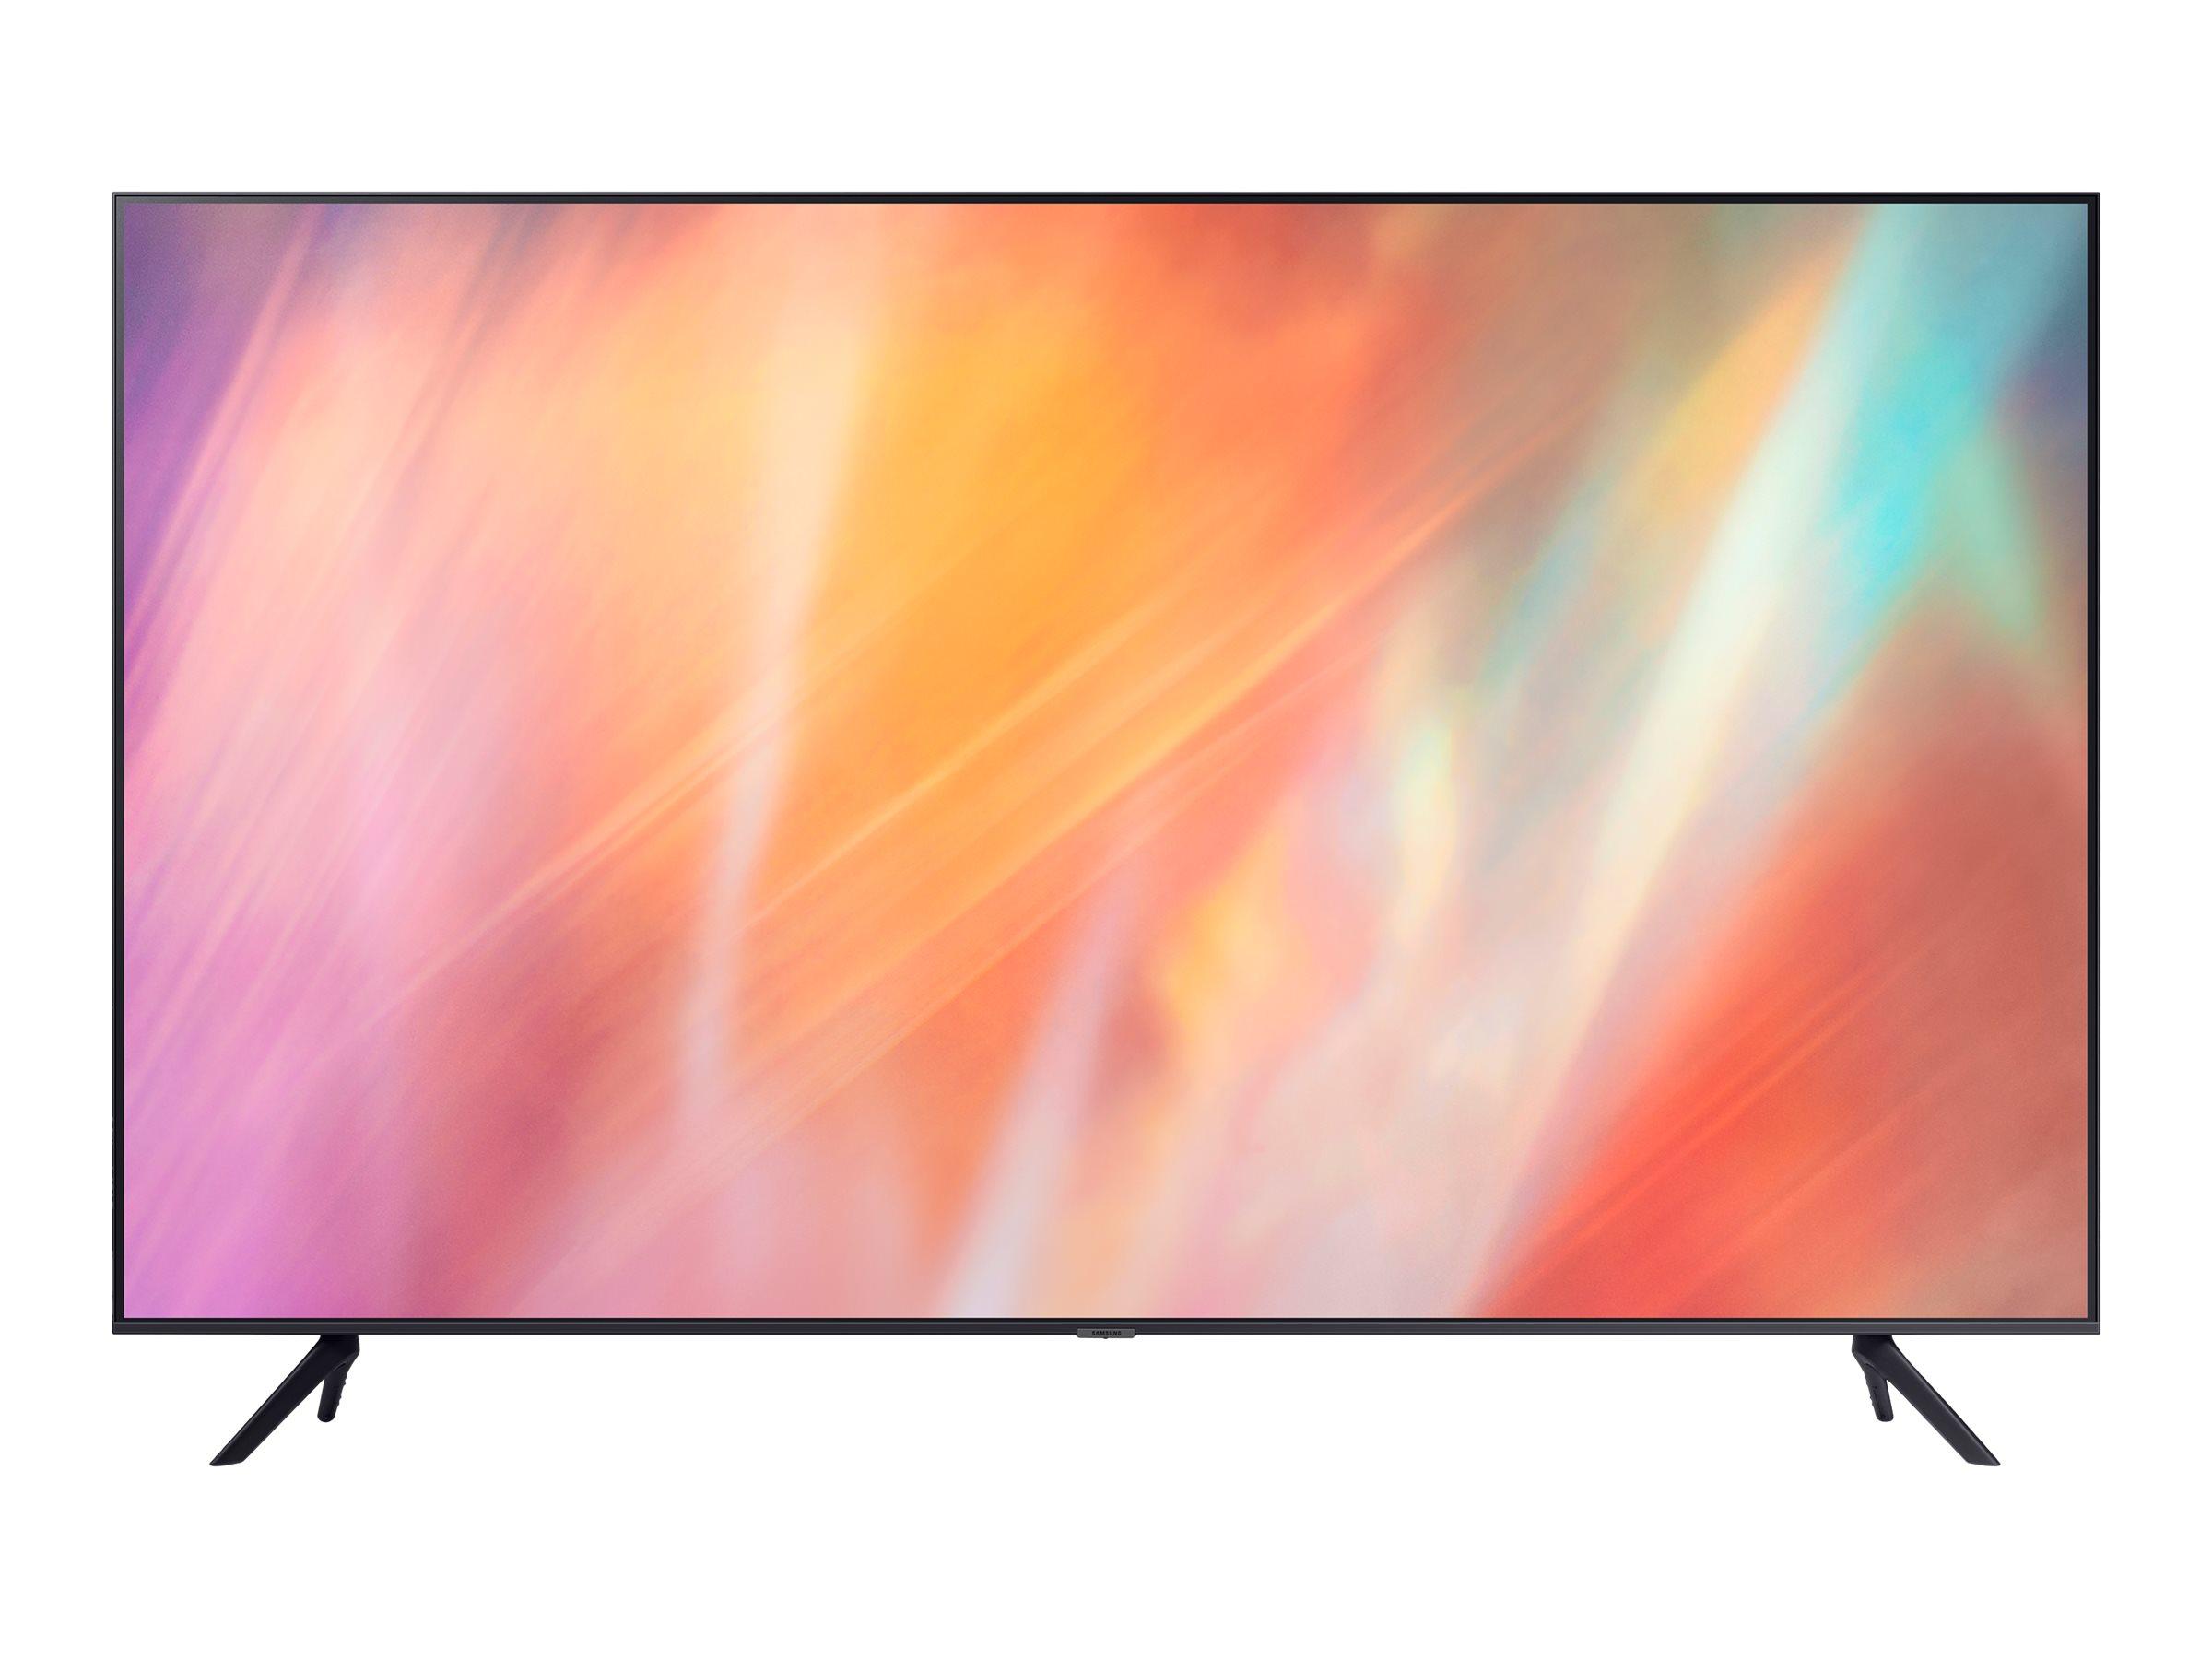 "Vorschau: Samsung BE65A-H - 163.9 cm (65"") Diagonalklasse BEA-H Series LCD-TV mit LED-Hintergrundbeleuchtung - Digital Signage - Smart TV - Tizen OS - 4K UHD (2160p)"